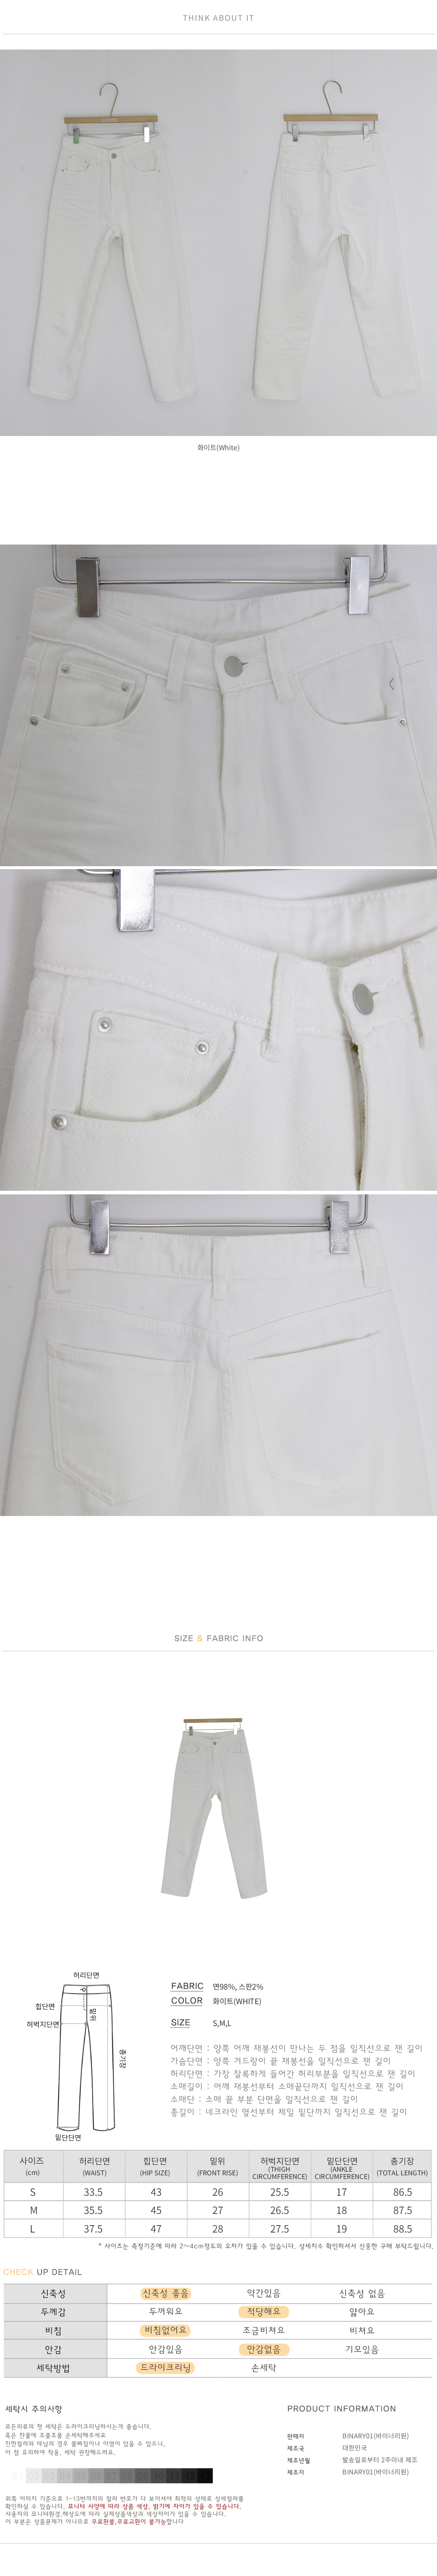 Slim Date Brit White Pants